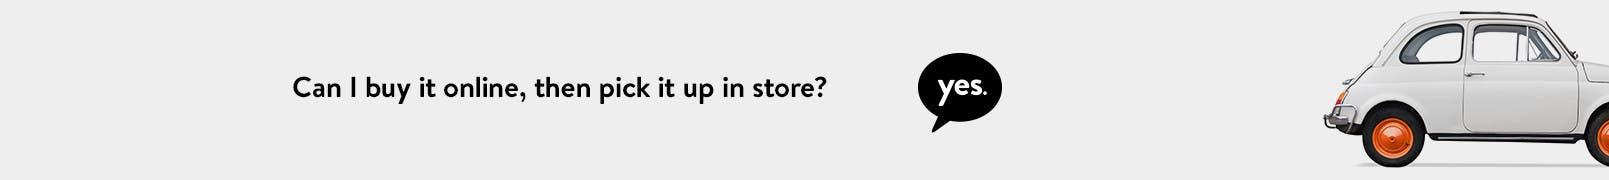 Buy online, pick up in store.